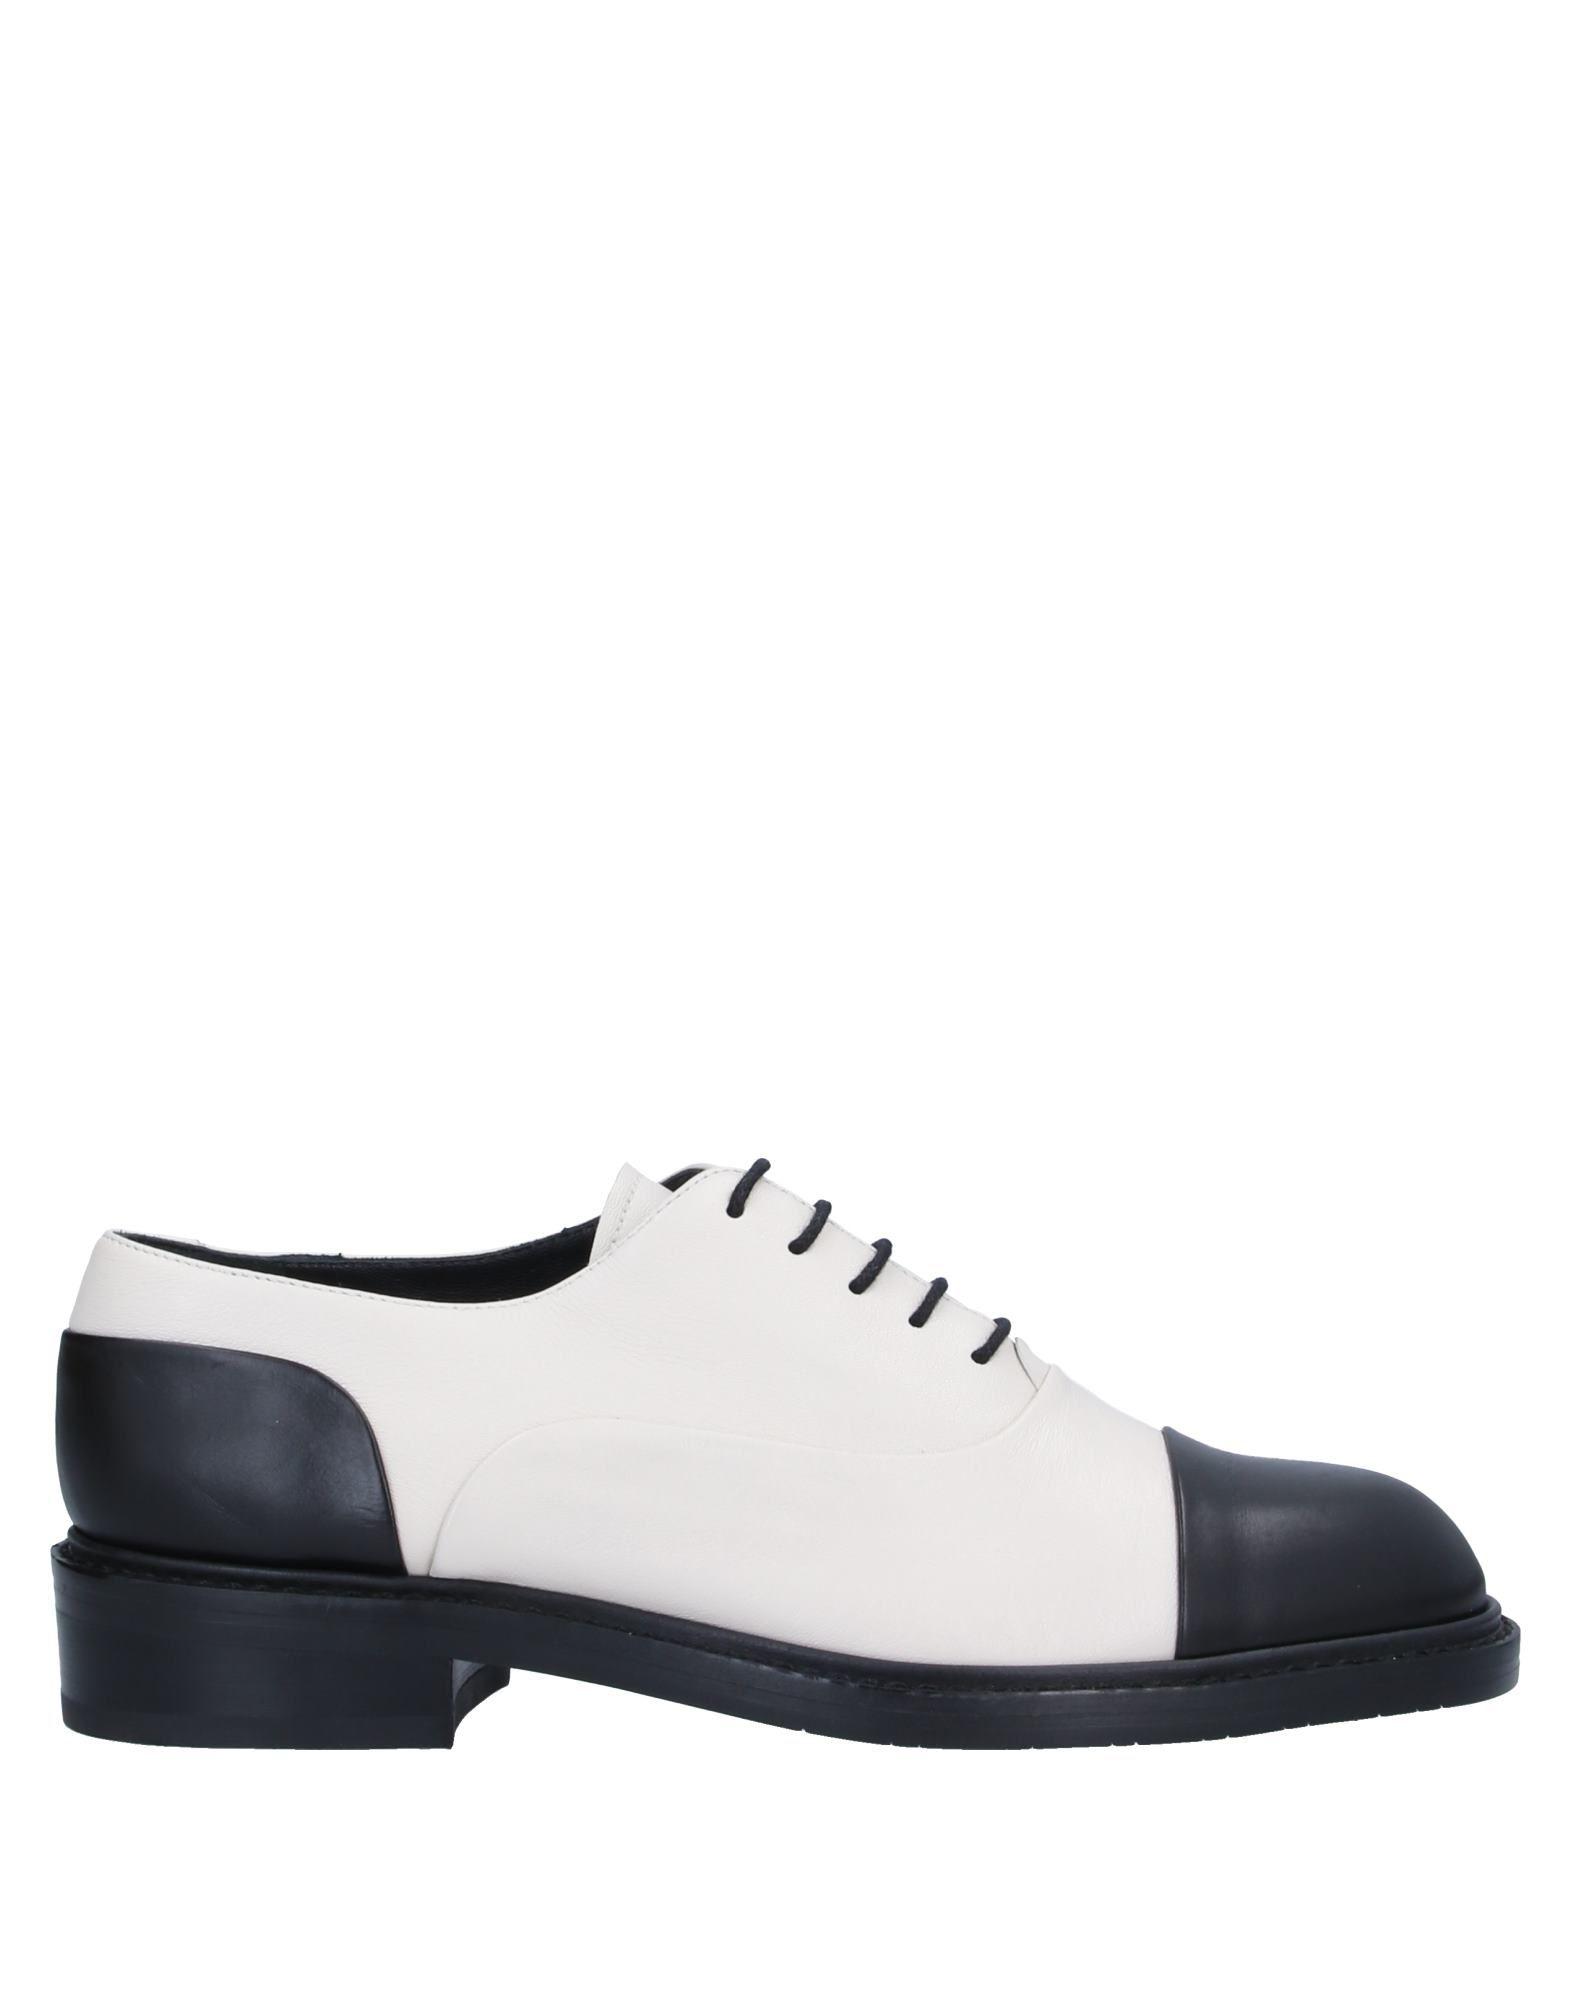 STUART WEITZMAN Обувь на шнурках